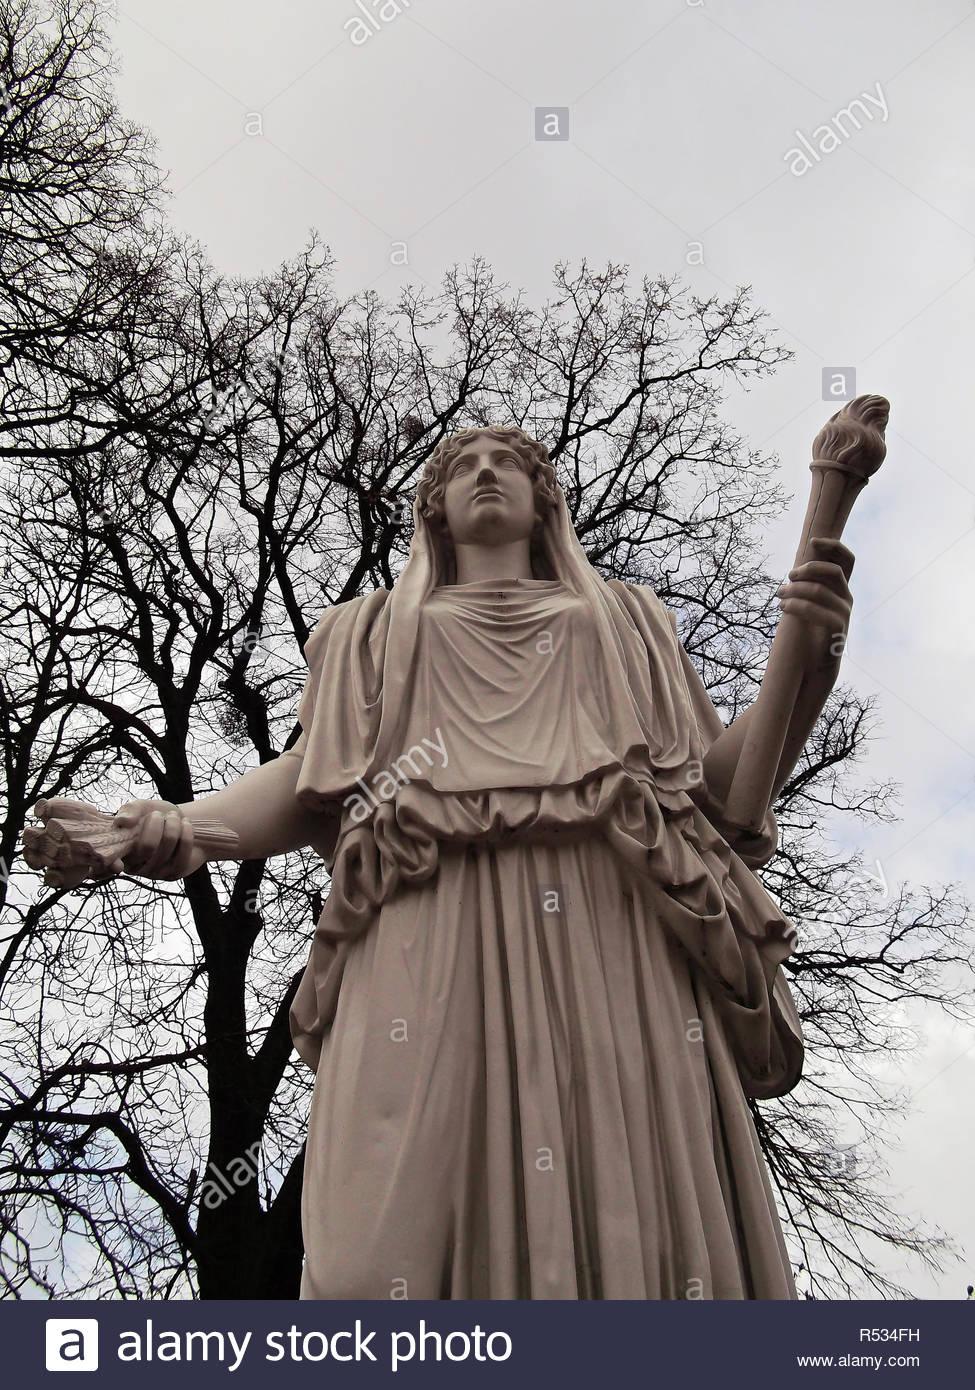 a mother goddess - Stock Image